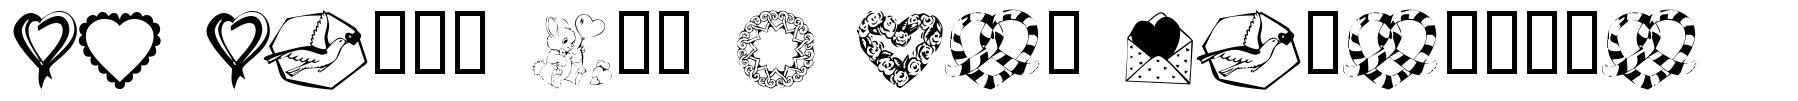 KR Kat's Got A New Valentine